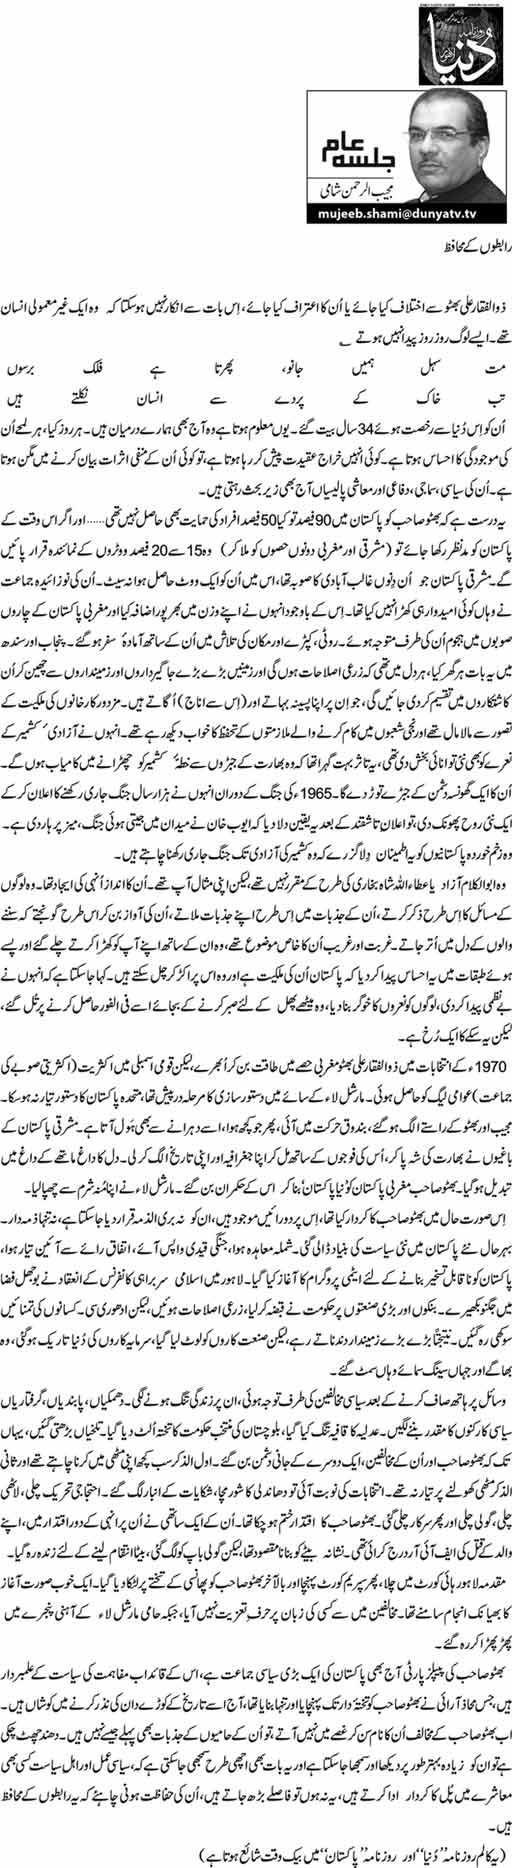 Rabton K Muhafiz - Mujeeb ur Rehman Shami